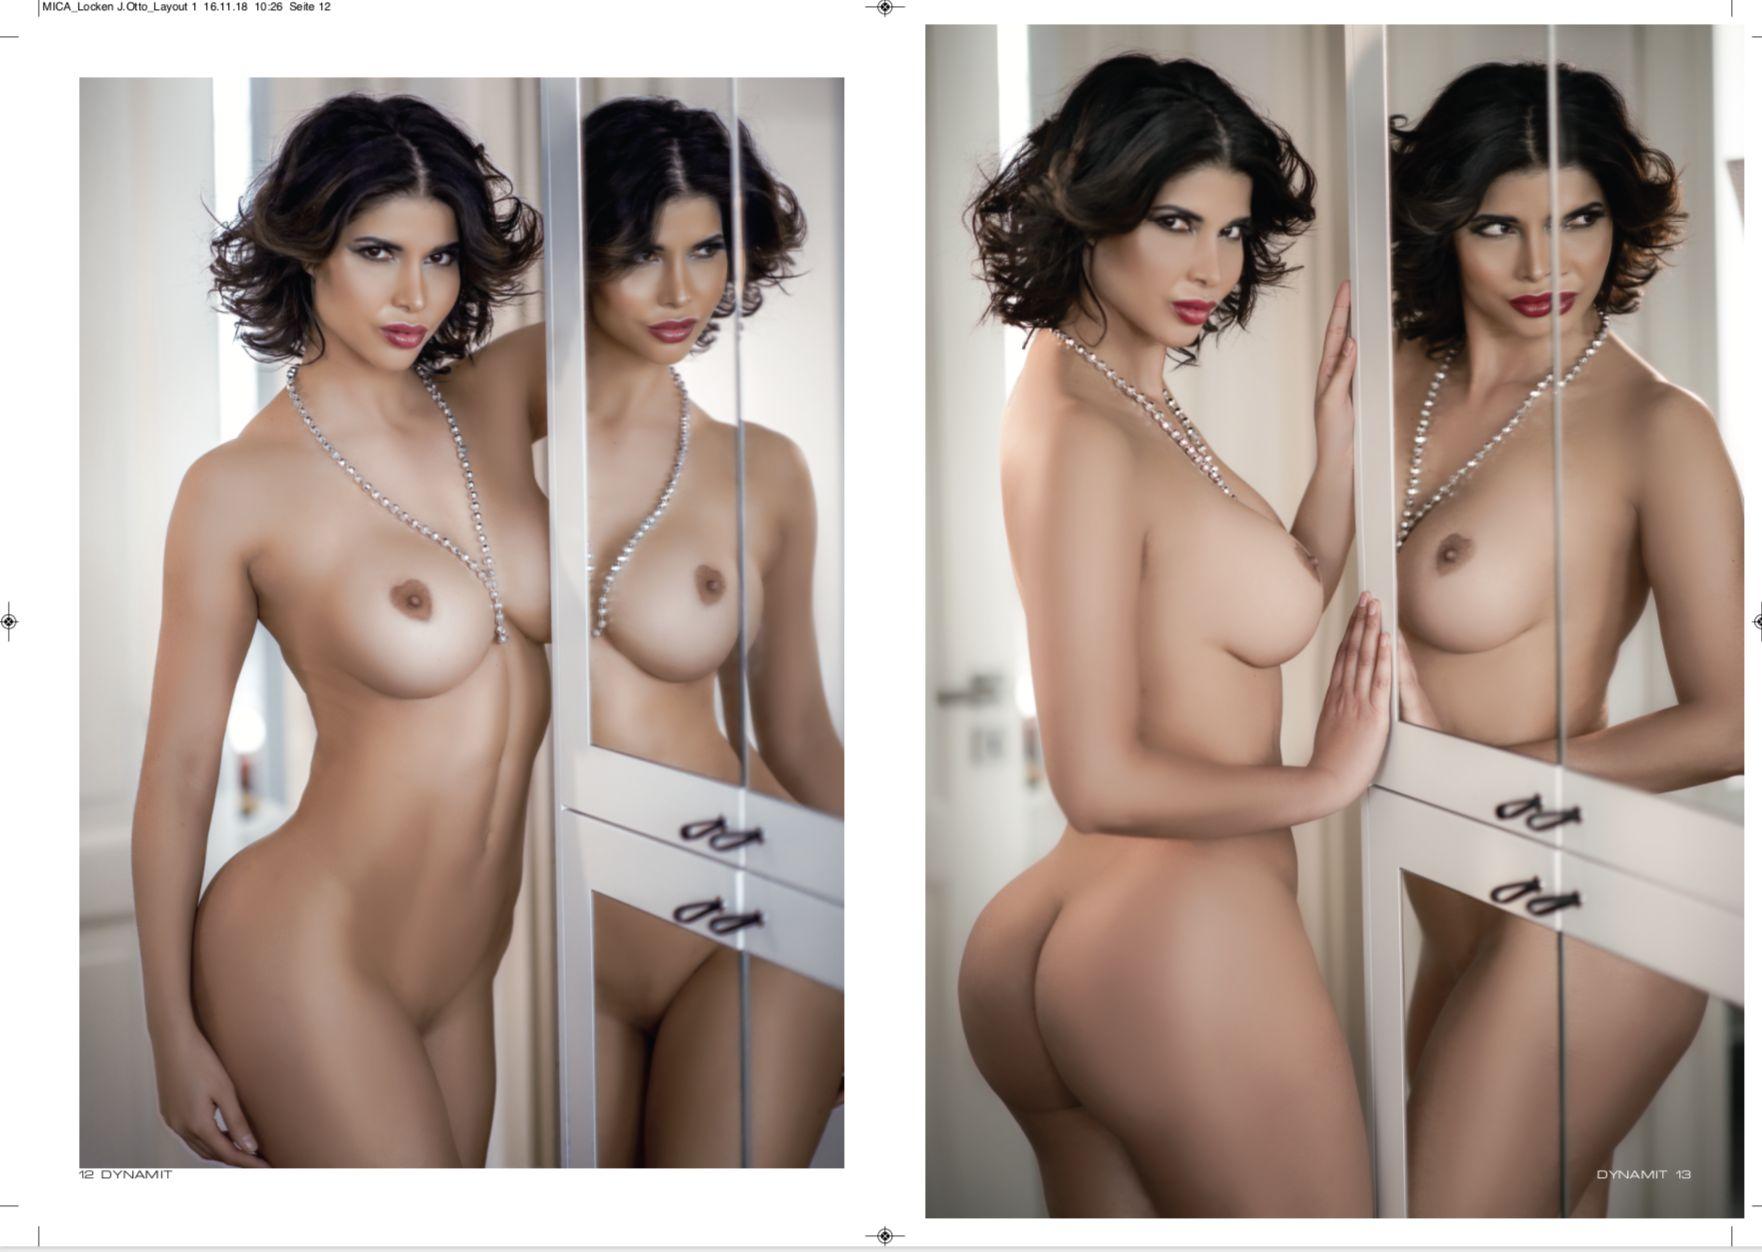 Micaela Schaefer Naked (6 New Photos) 5